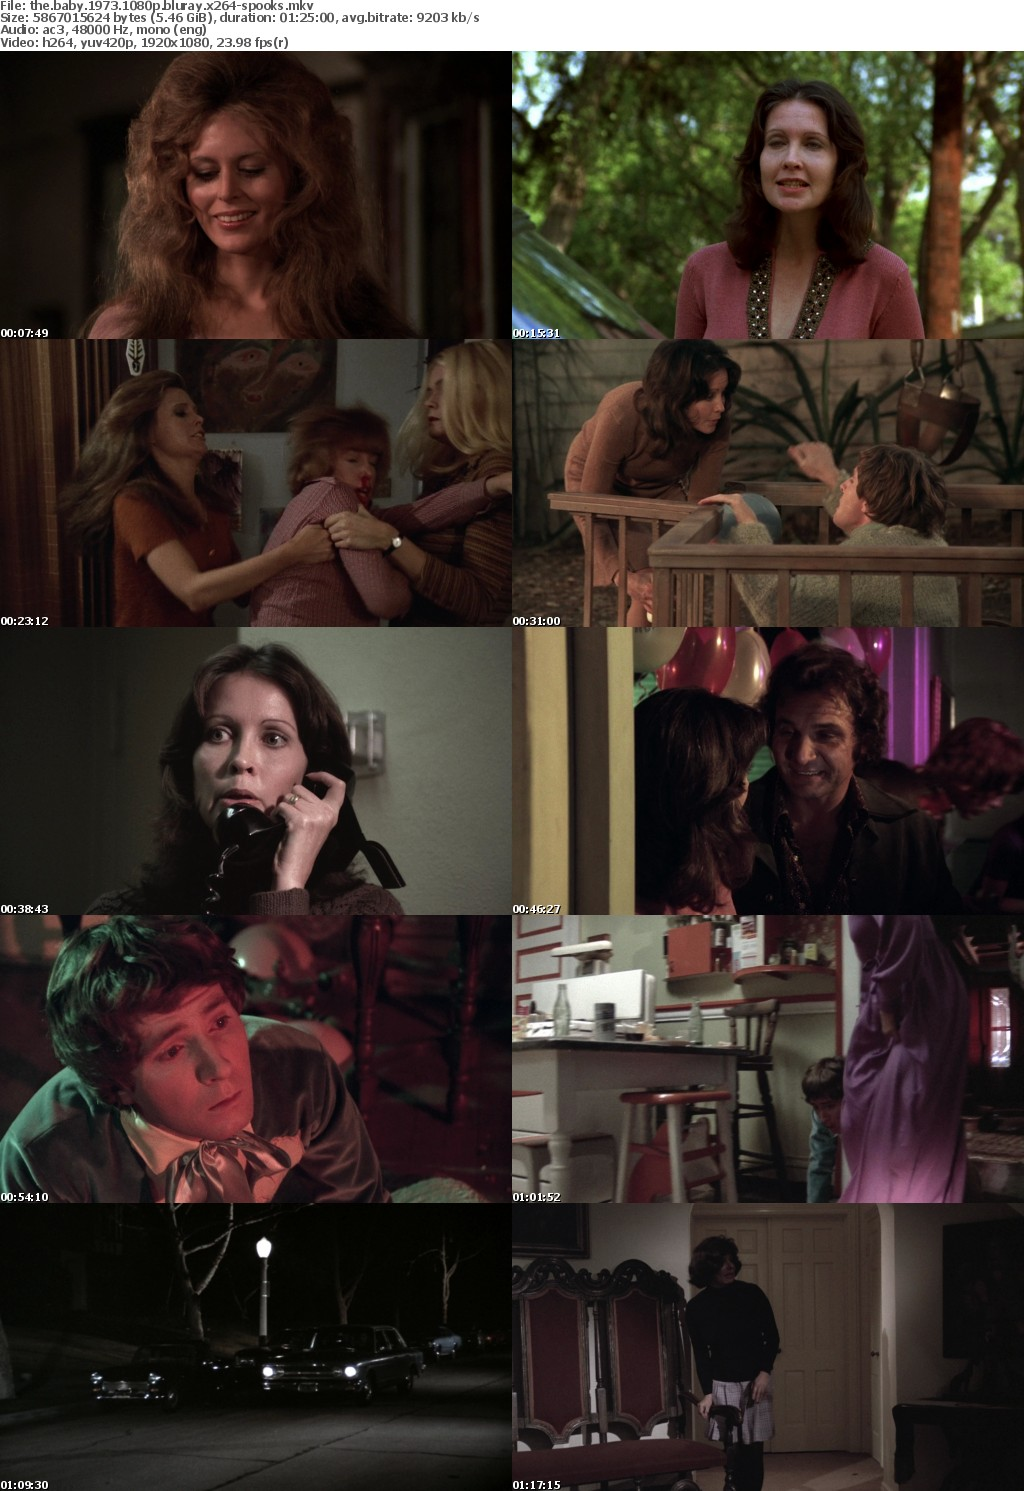 The Baby 1973 1080p BluRay x264-SPOOKS